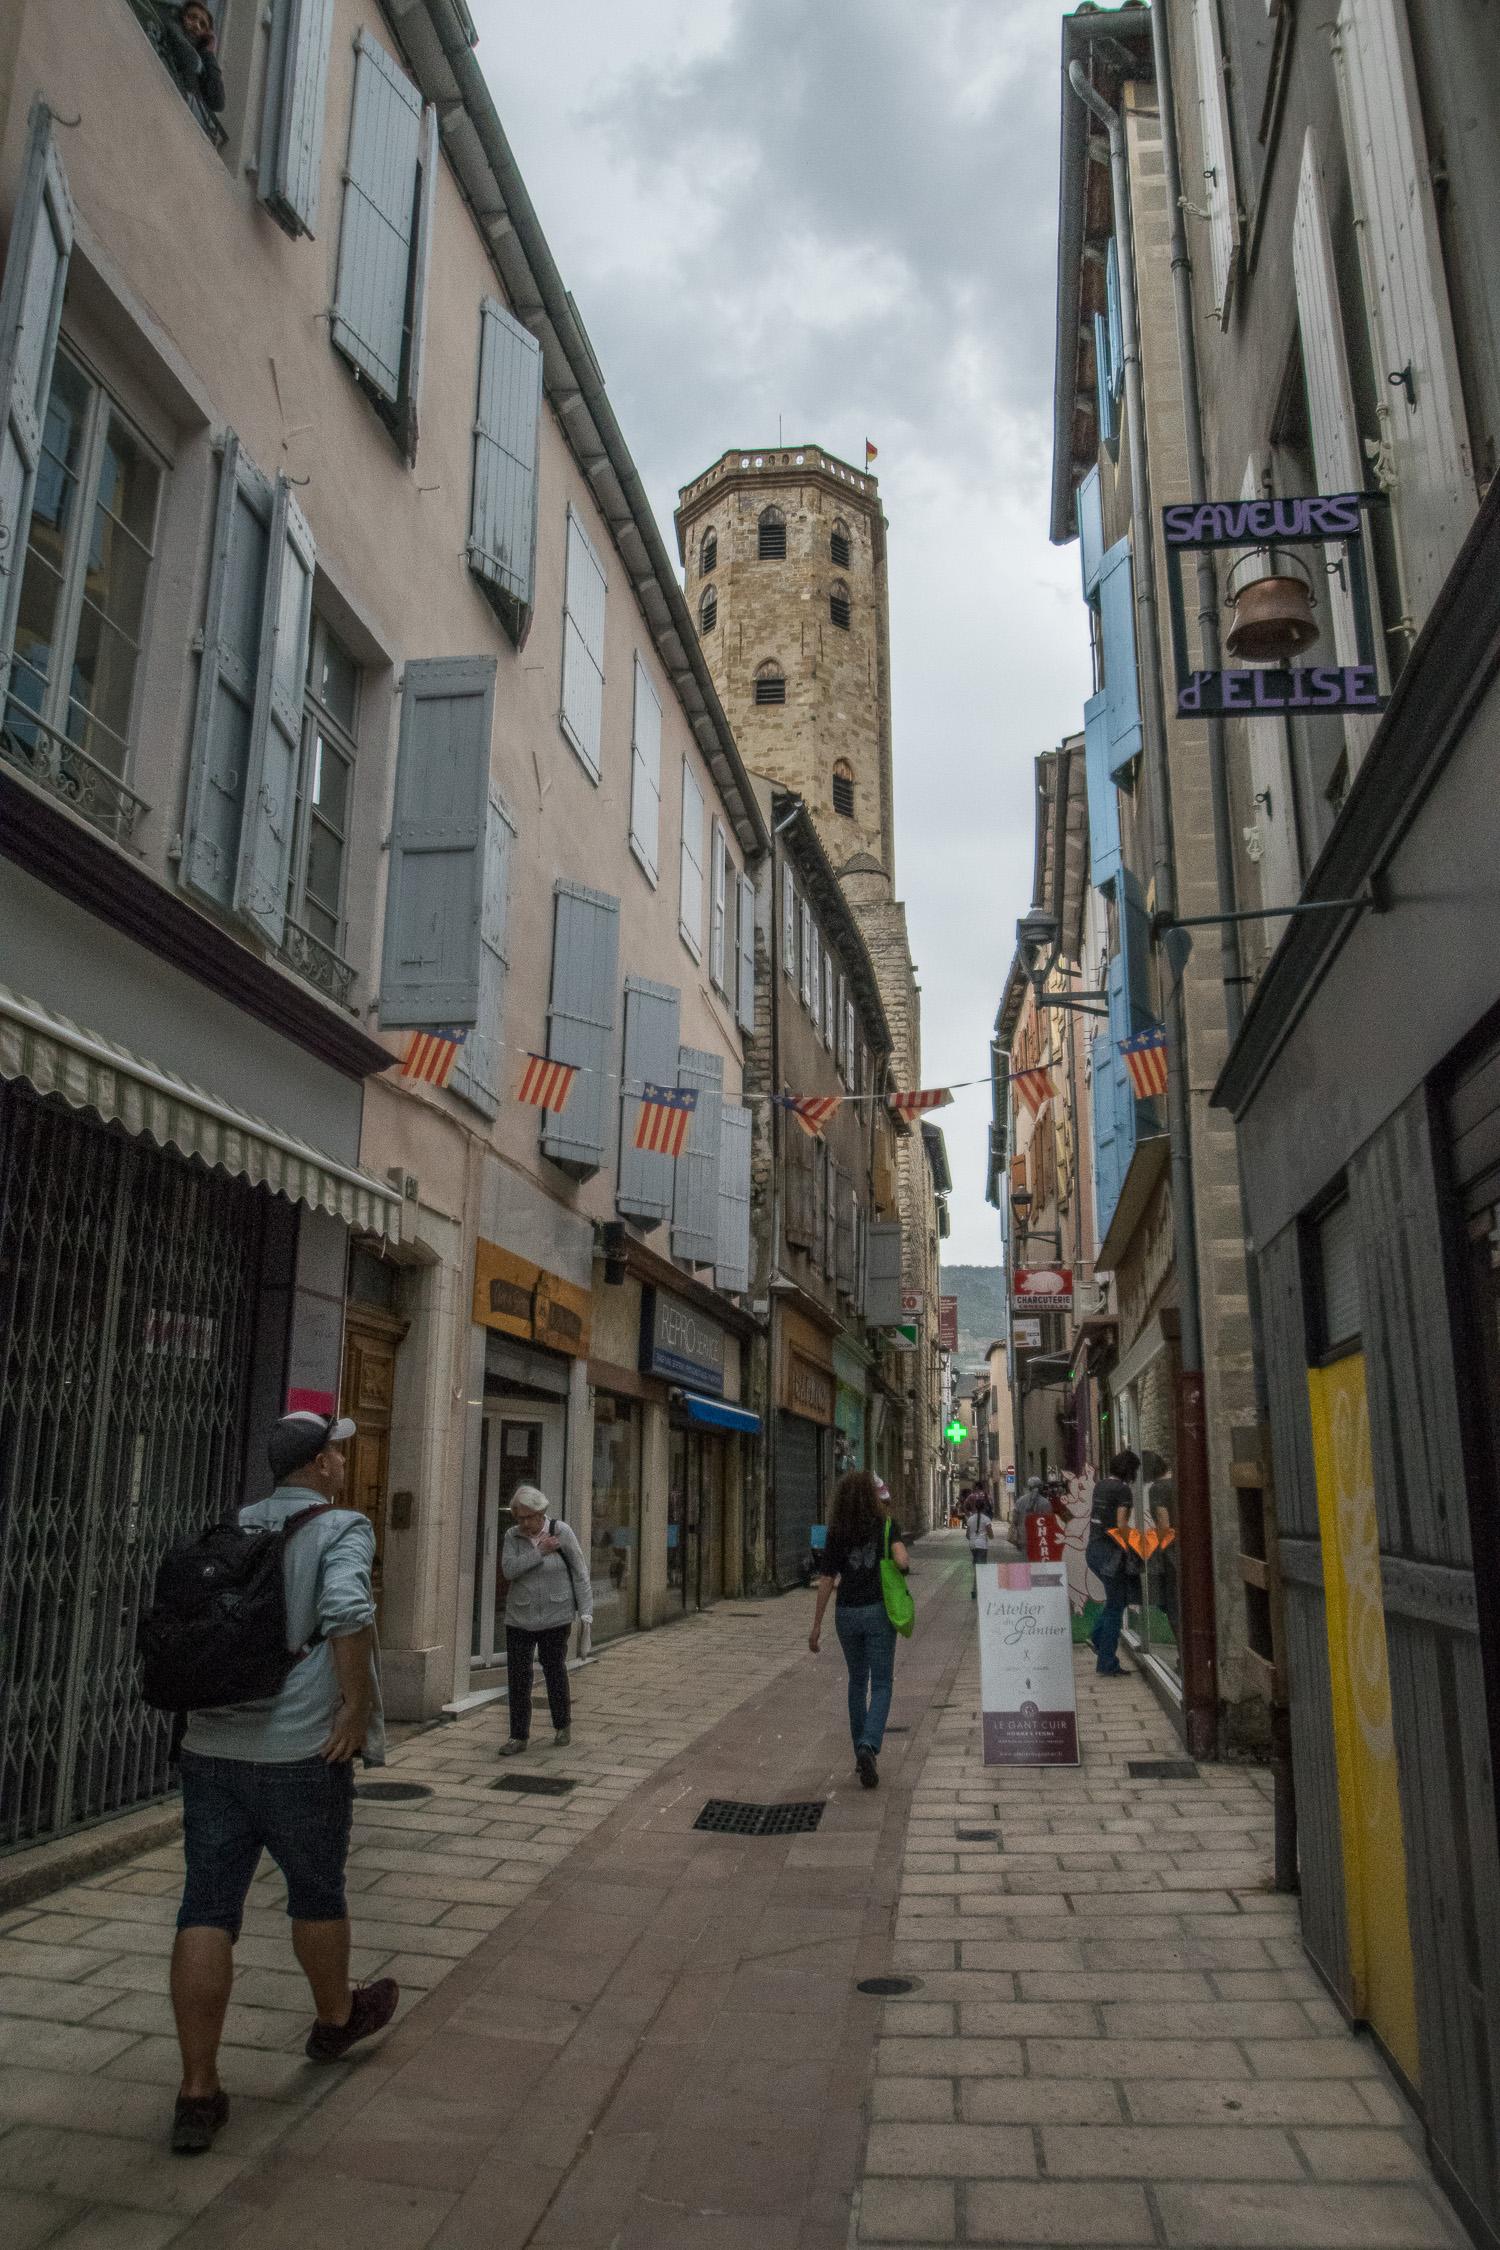 Dans les rues de Millau